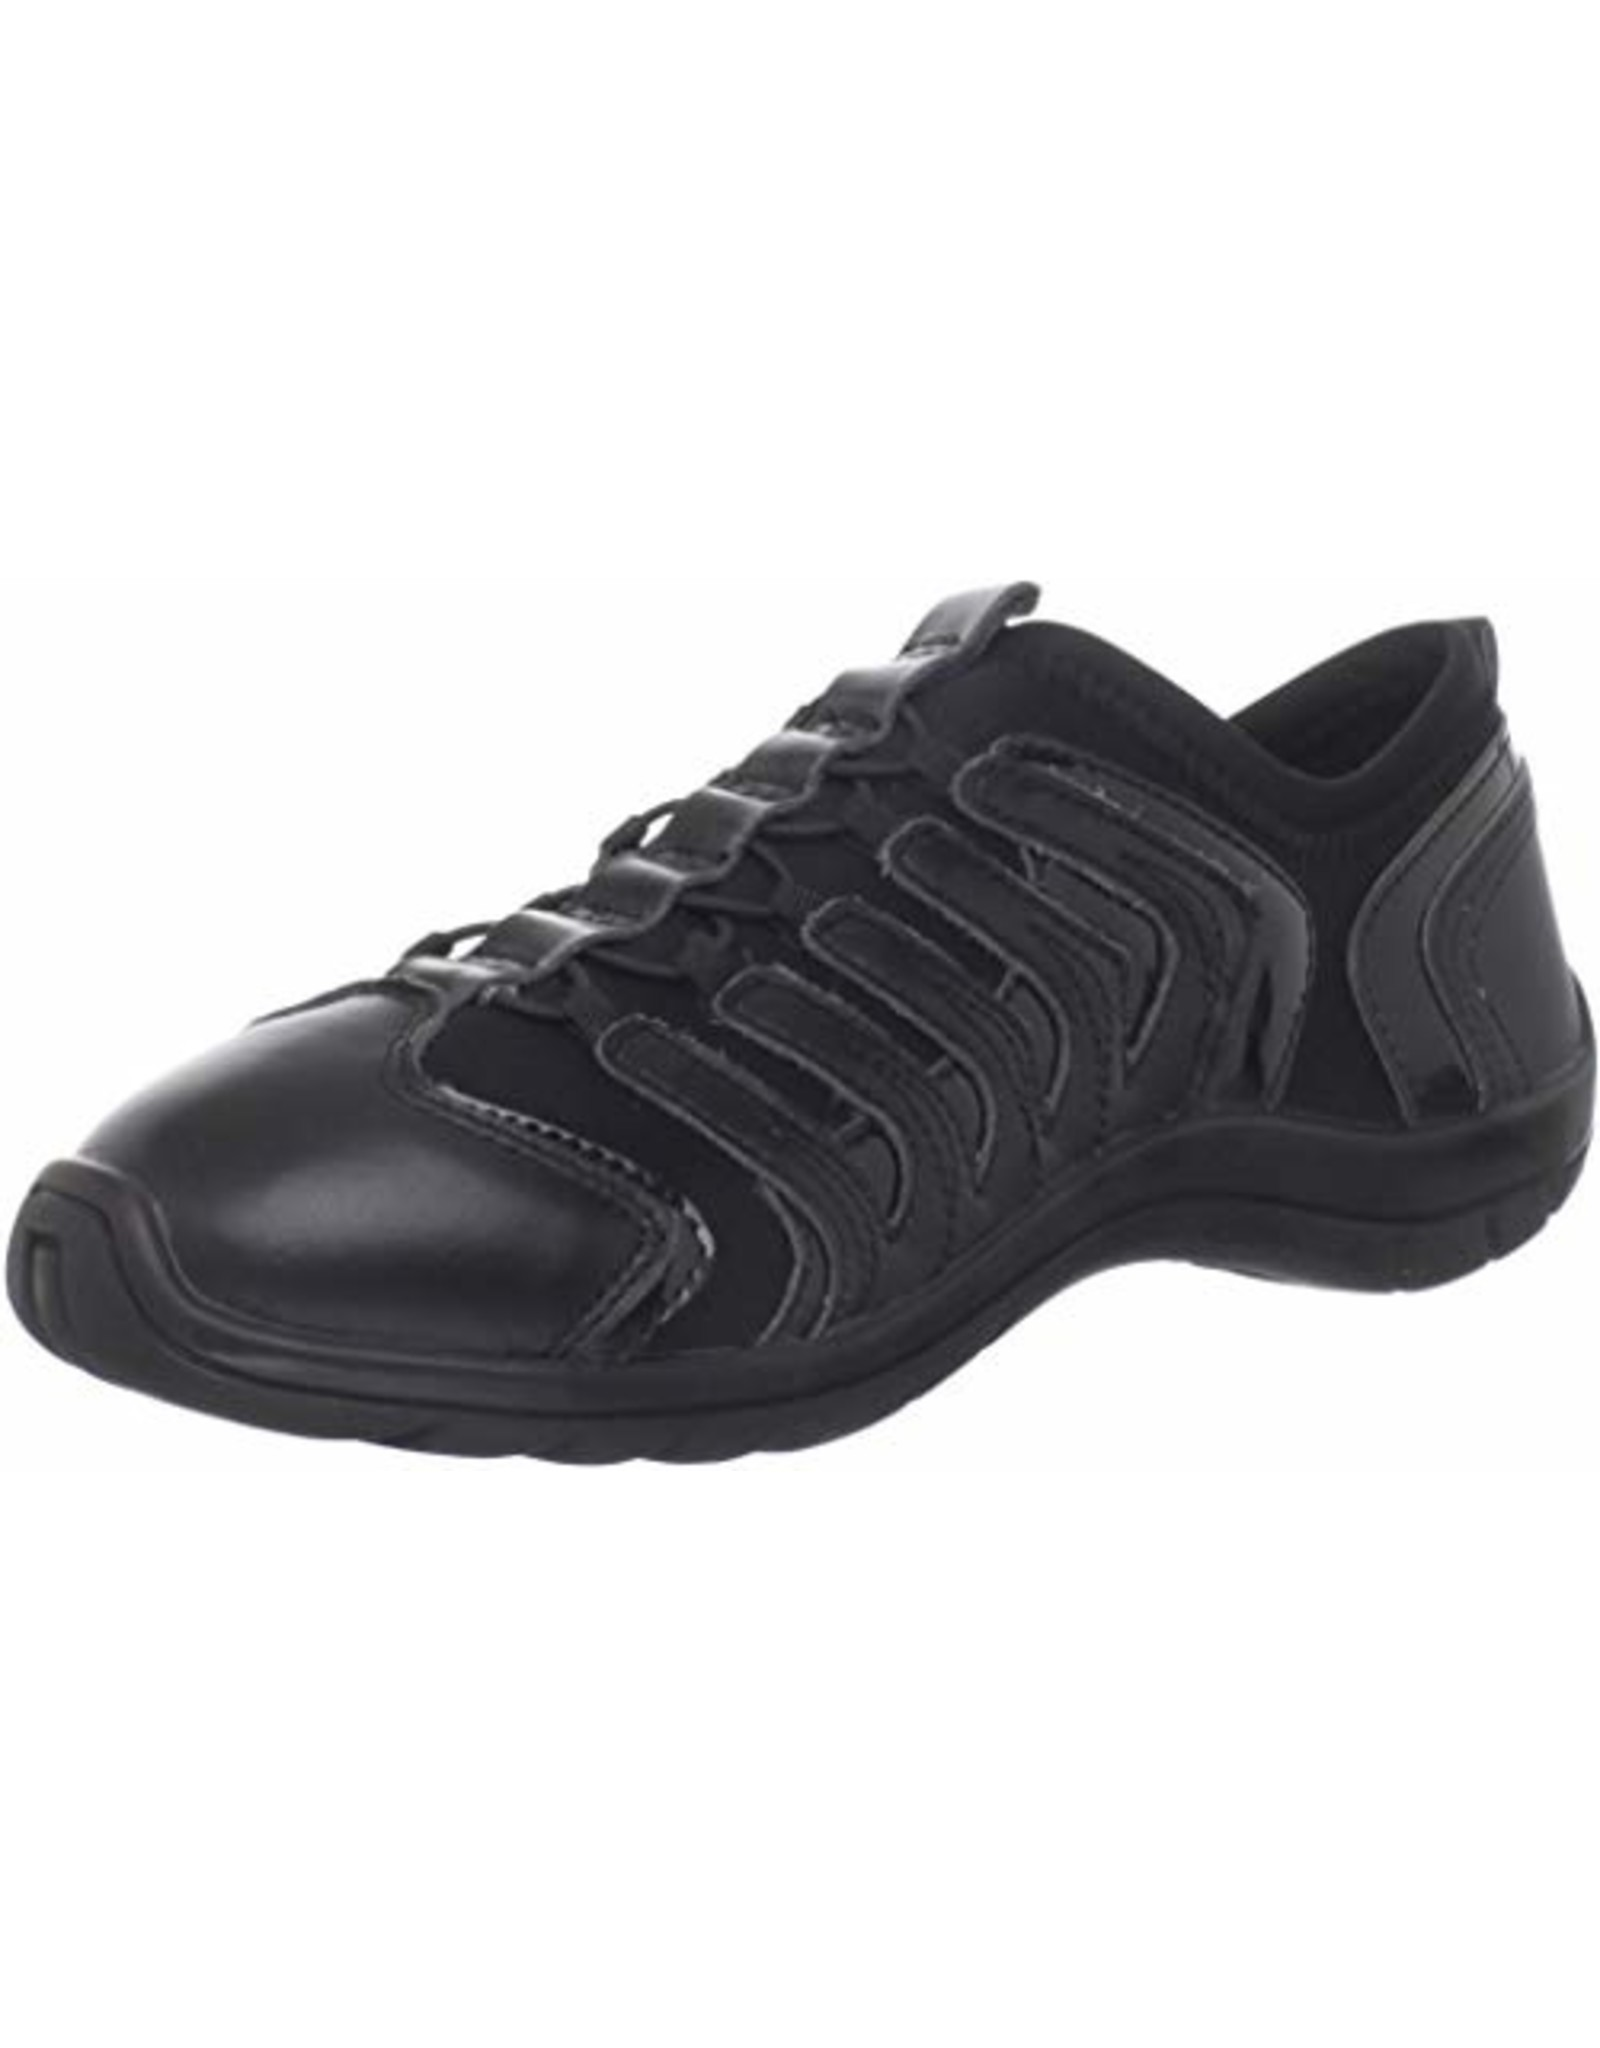 Capezio DS100 SNAKESPINE DANCESNEAKER BLACK